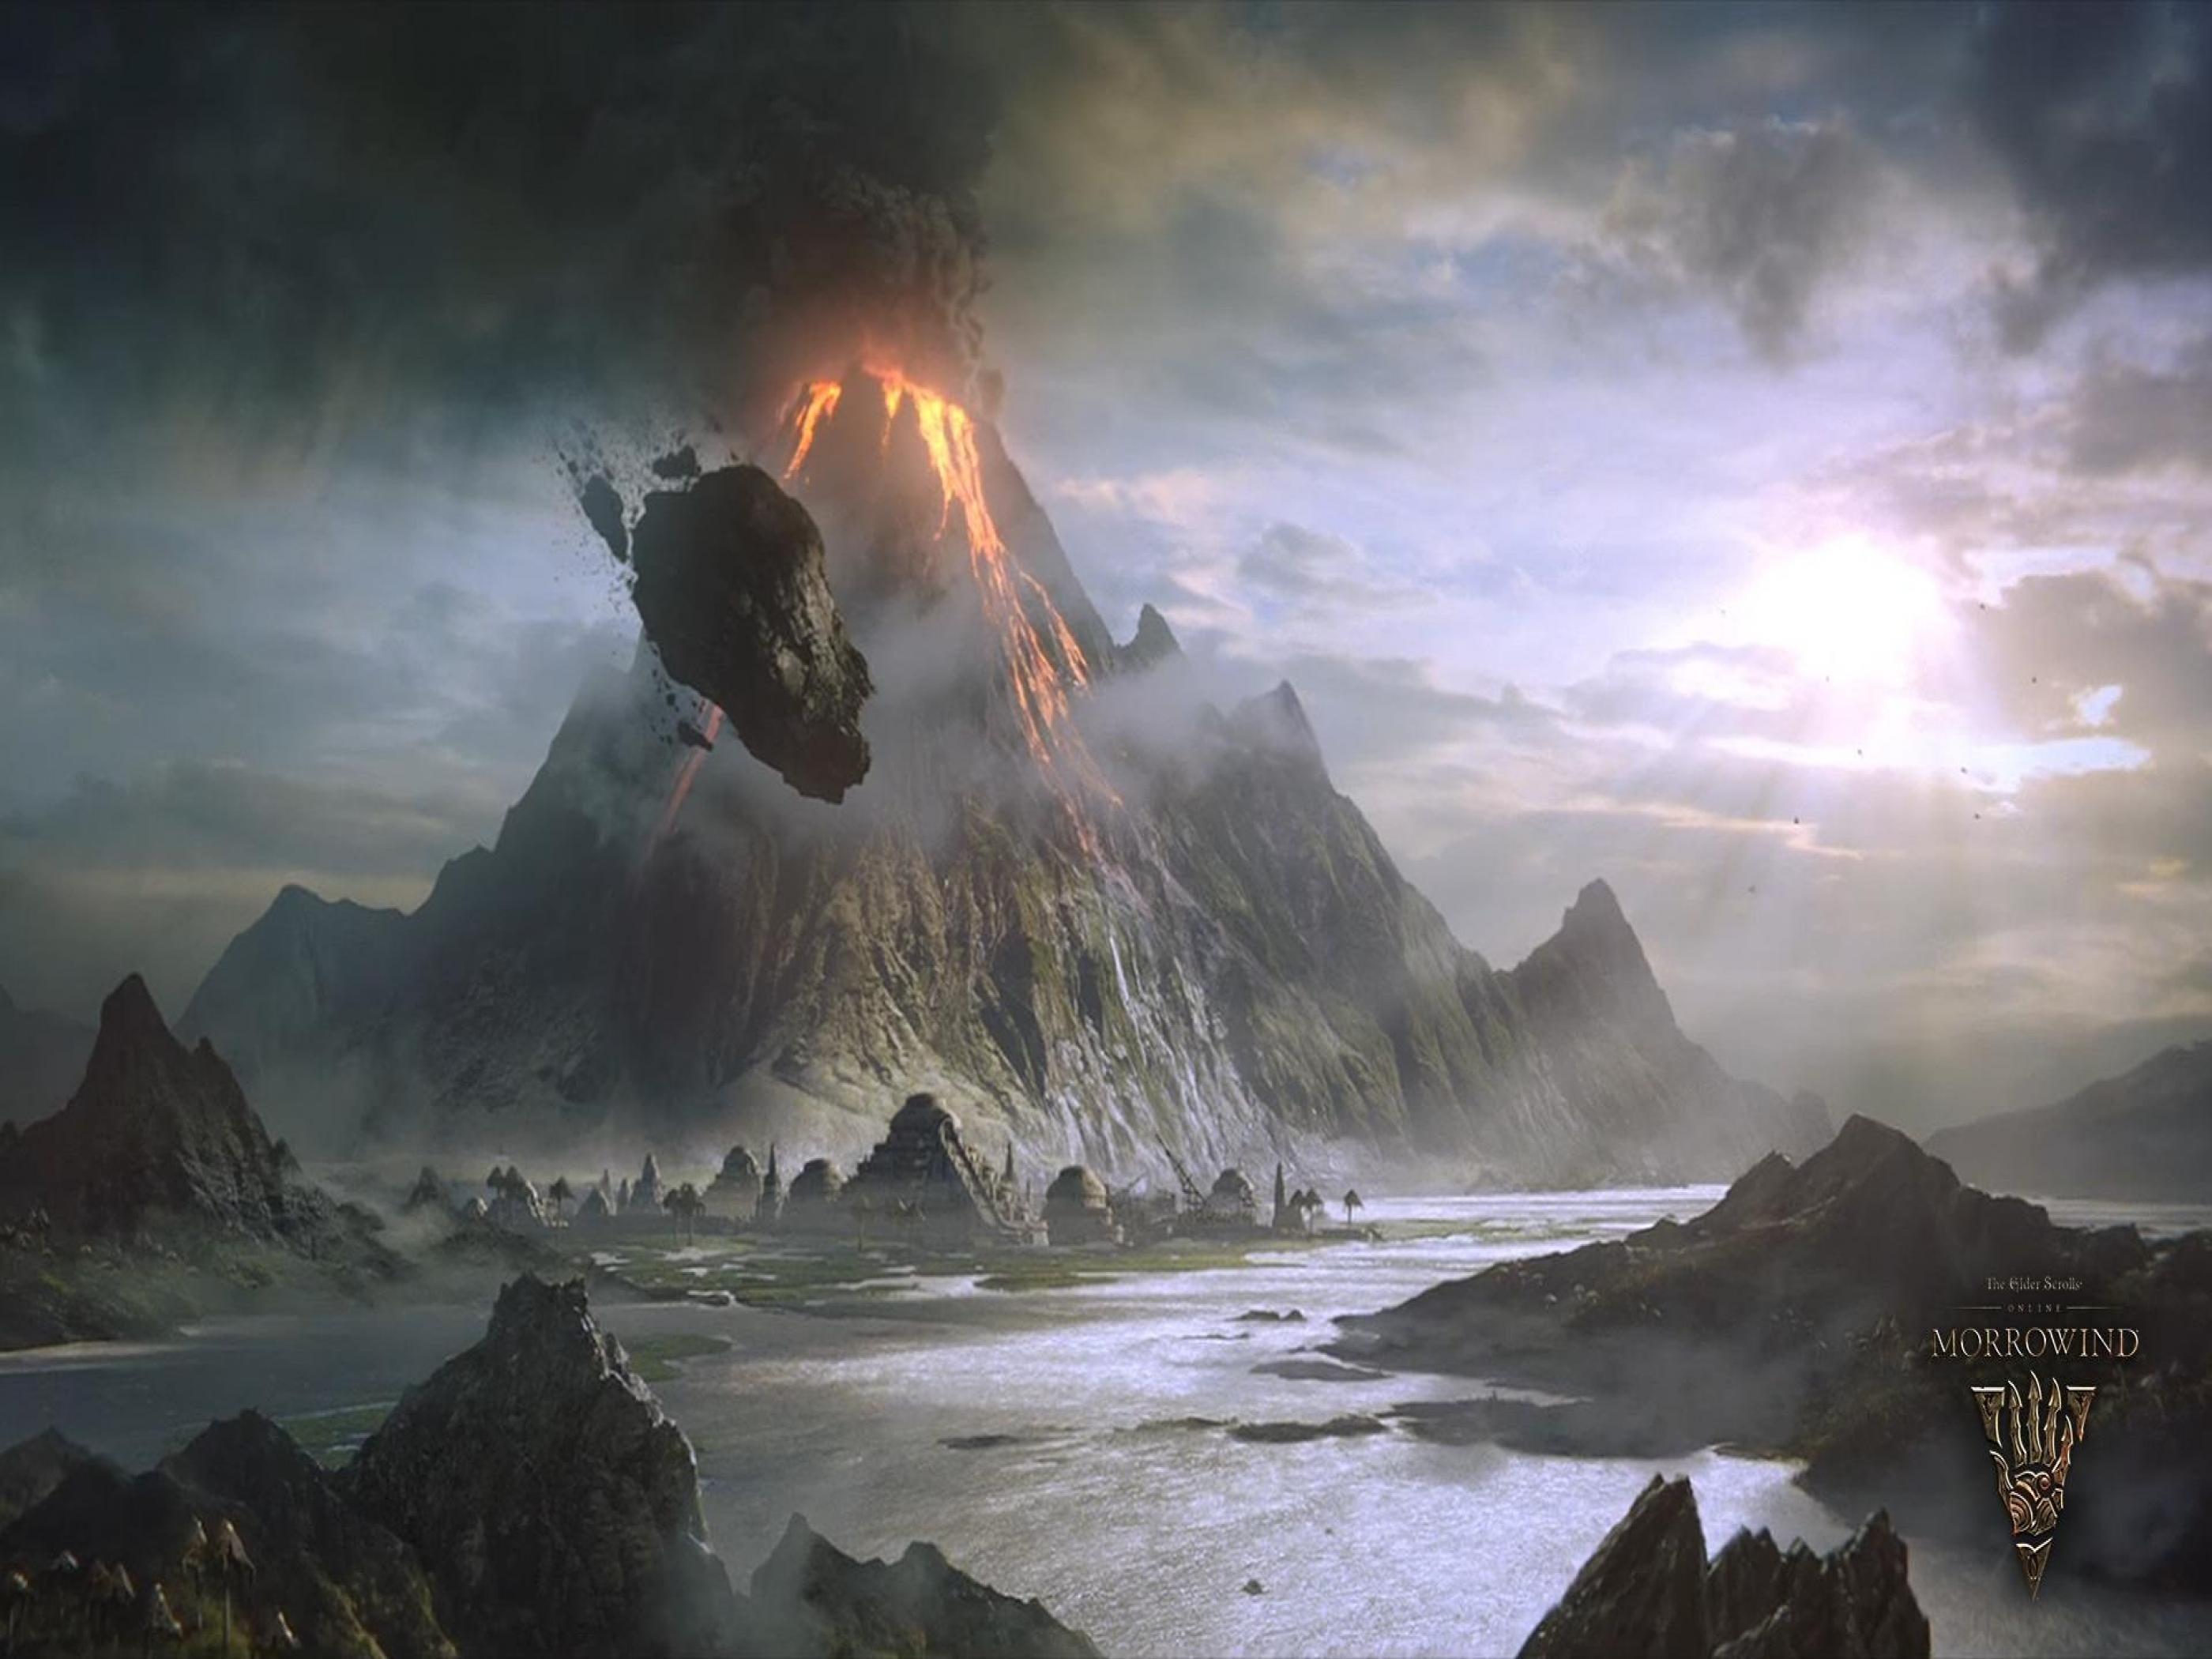 Morrowind Wallpapers Top Free Morrowind Backgrounds